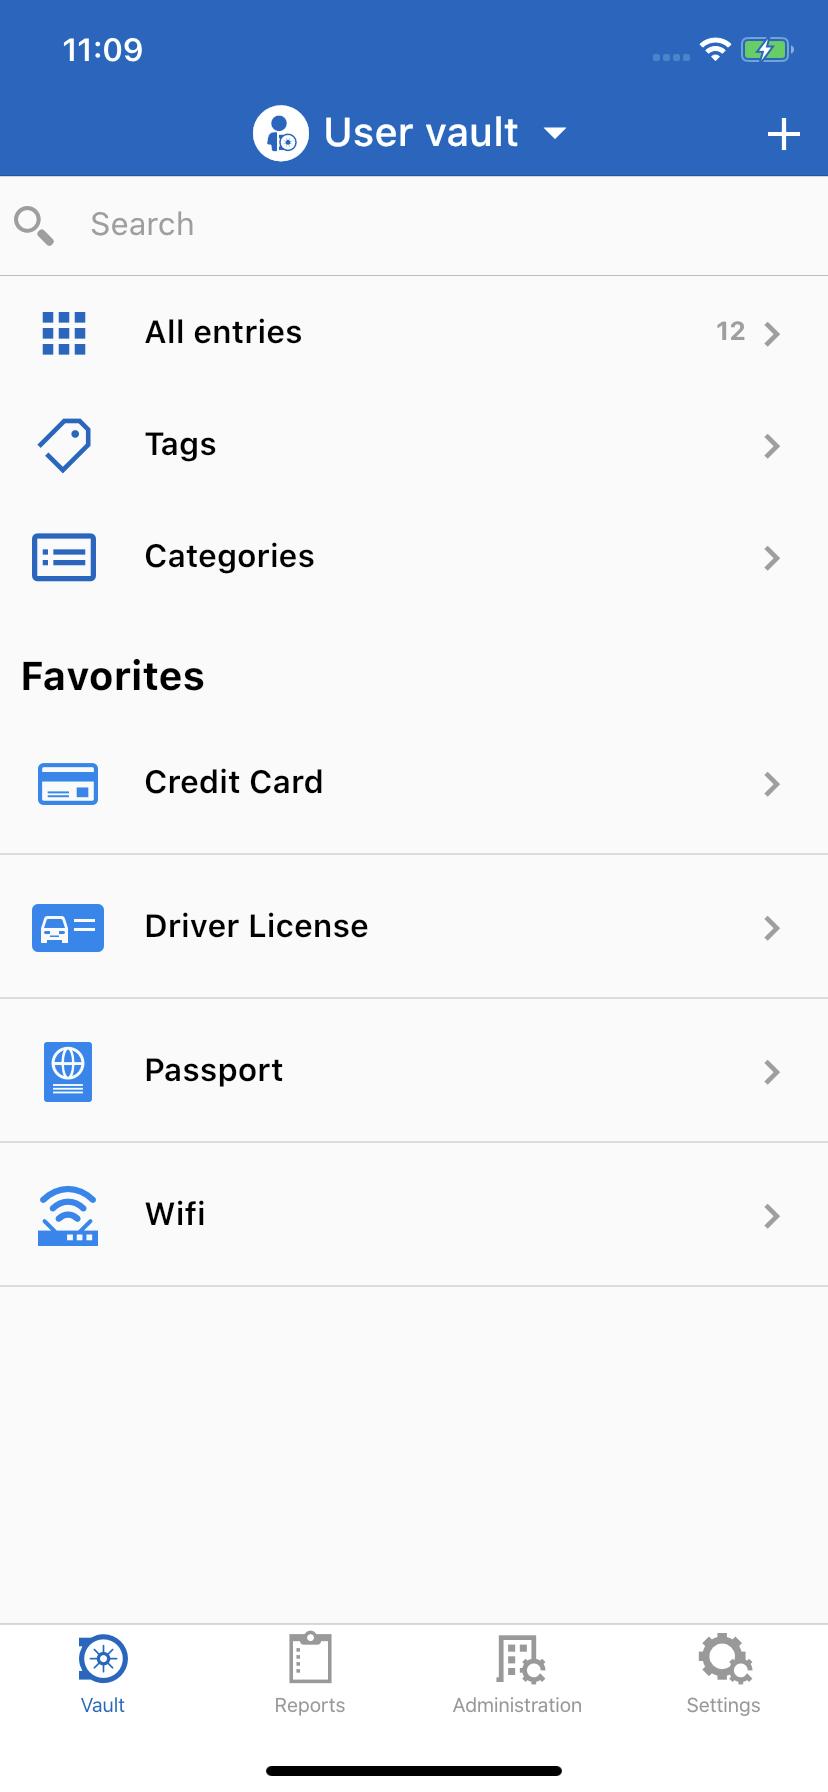 user-vault-Password-Hub-Business-IOS